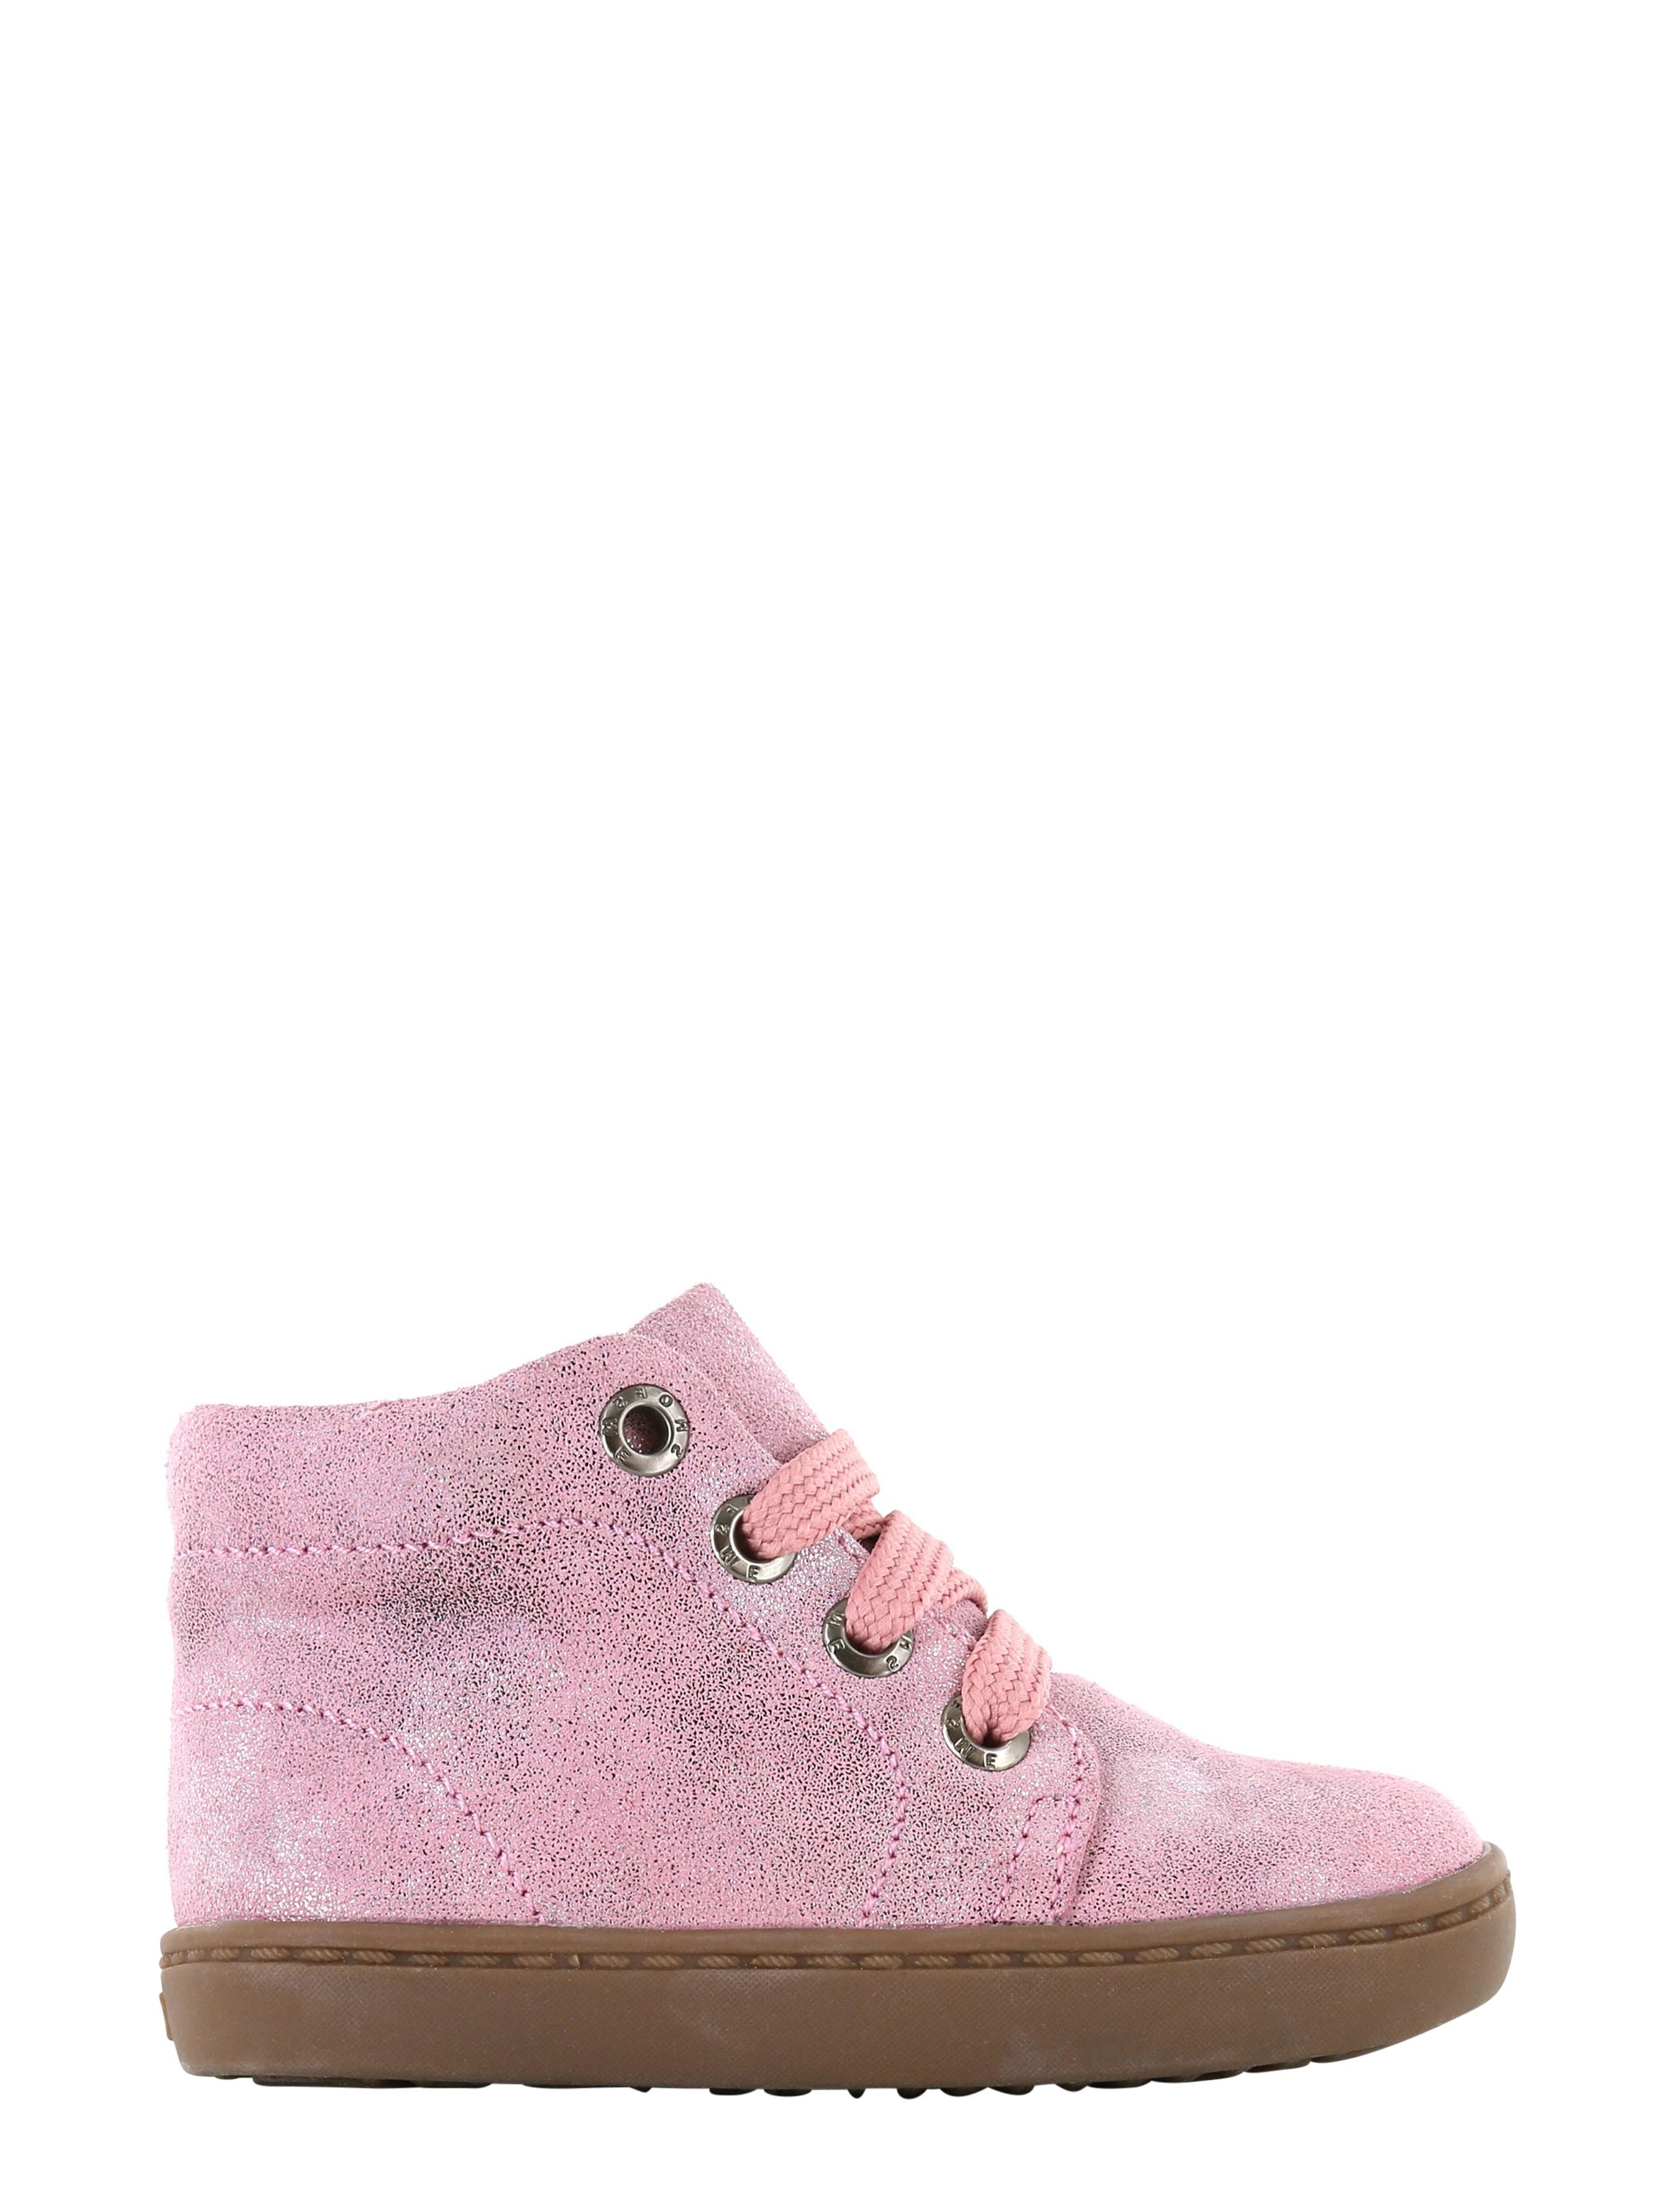 Shoesme FL21W001-A Pink Metallic Baby-schoenen